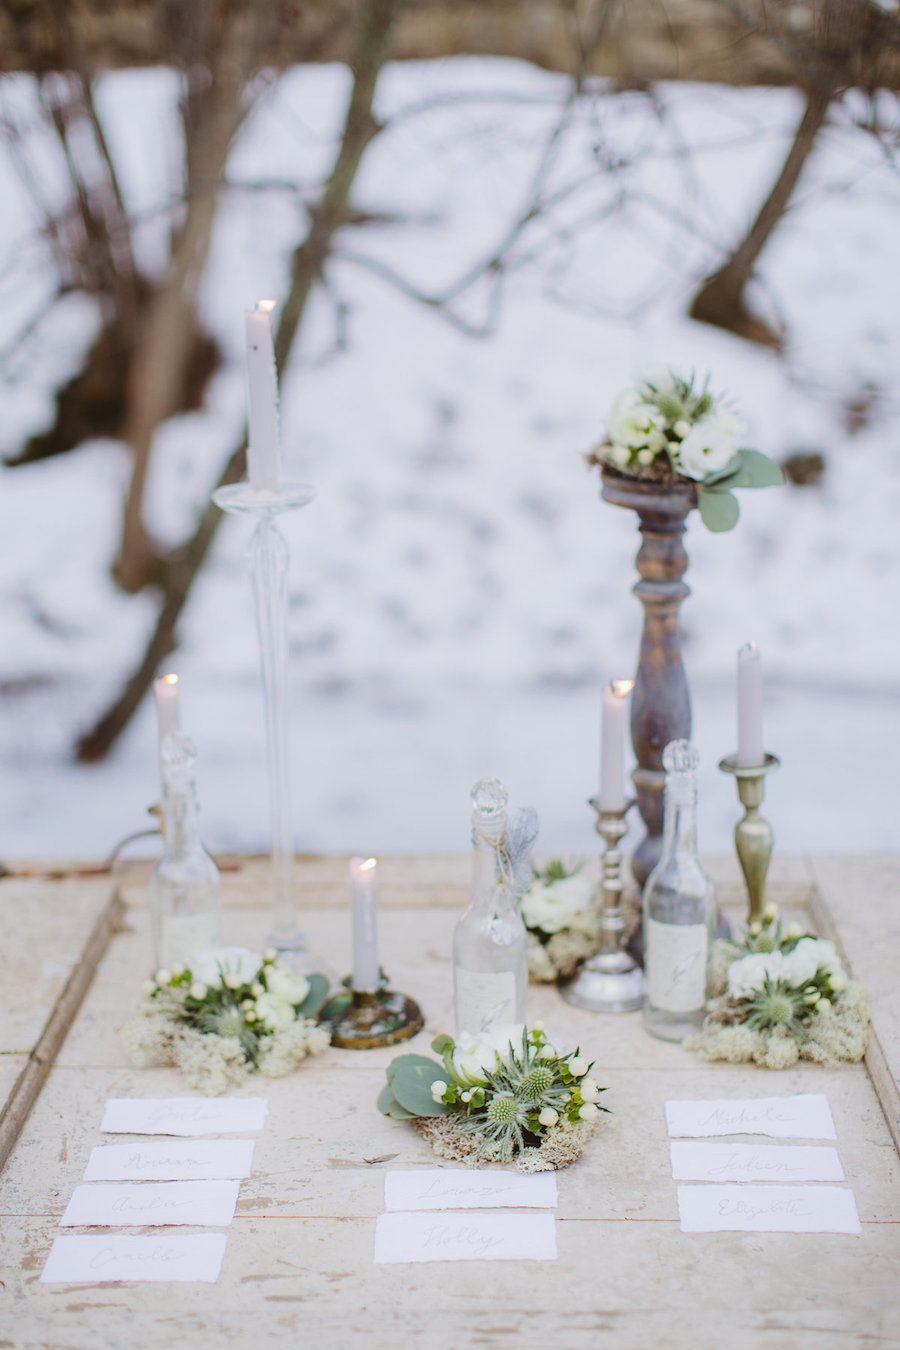 tableau de mariage invernale